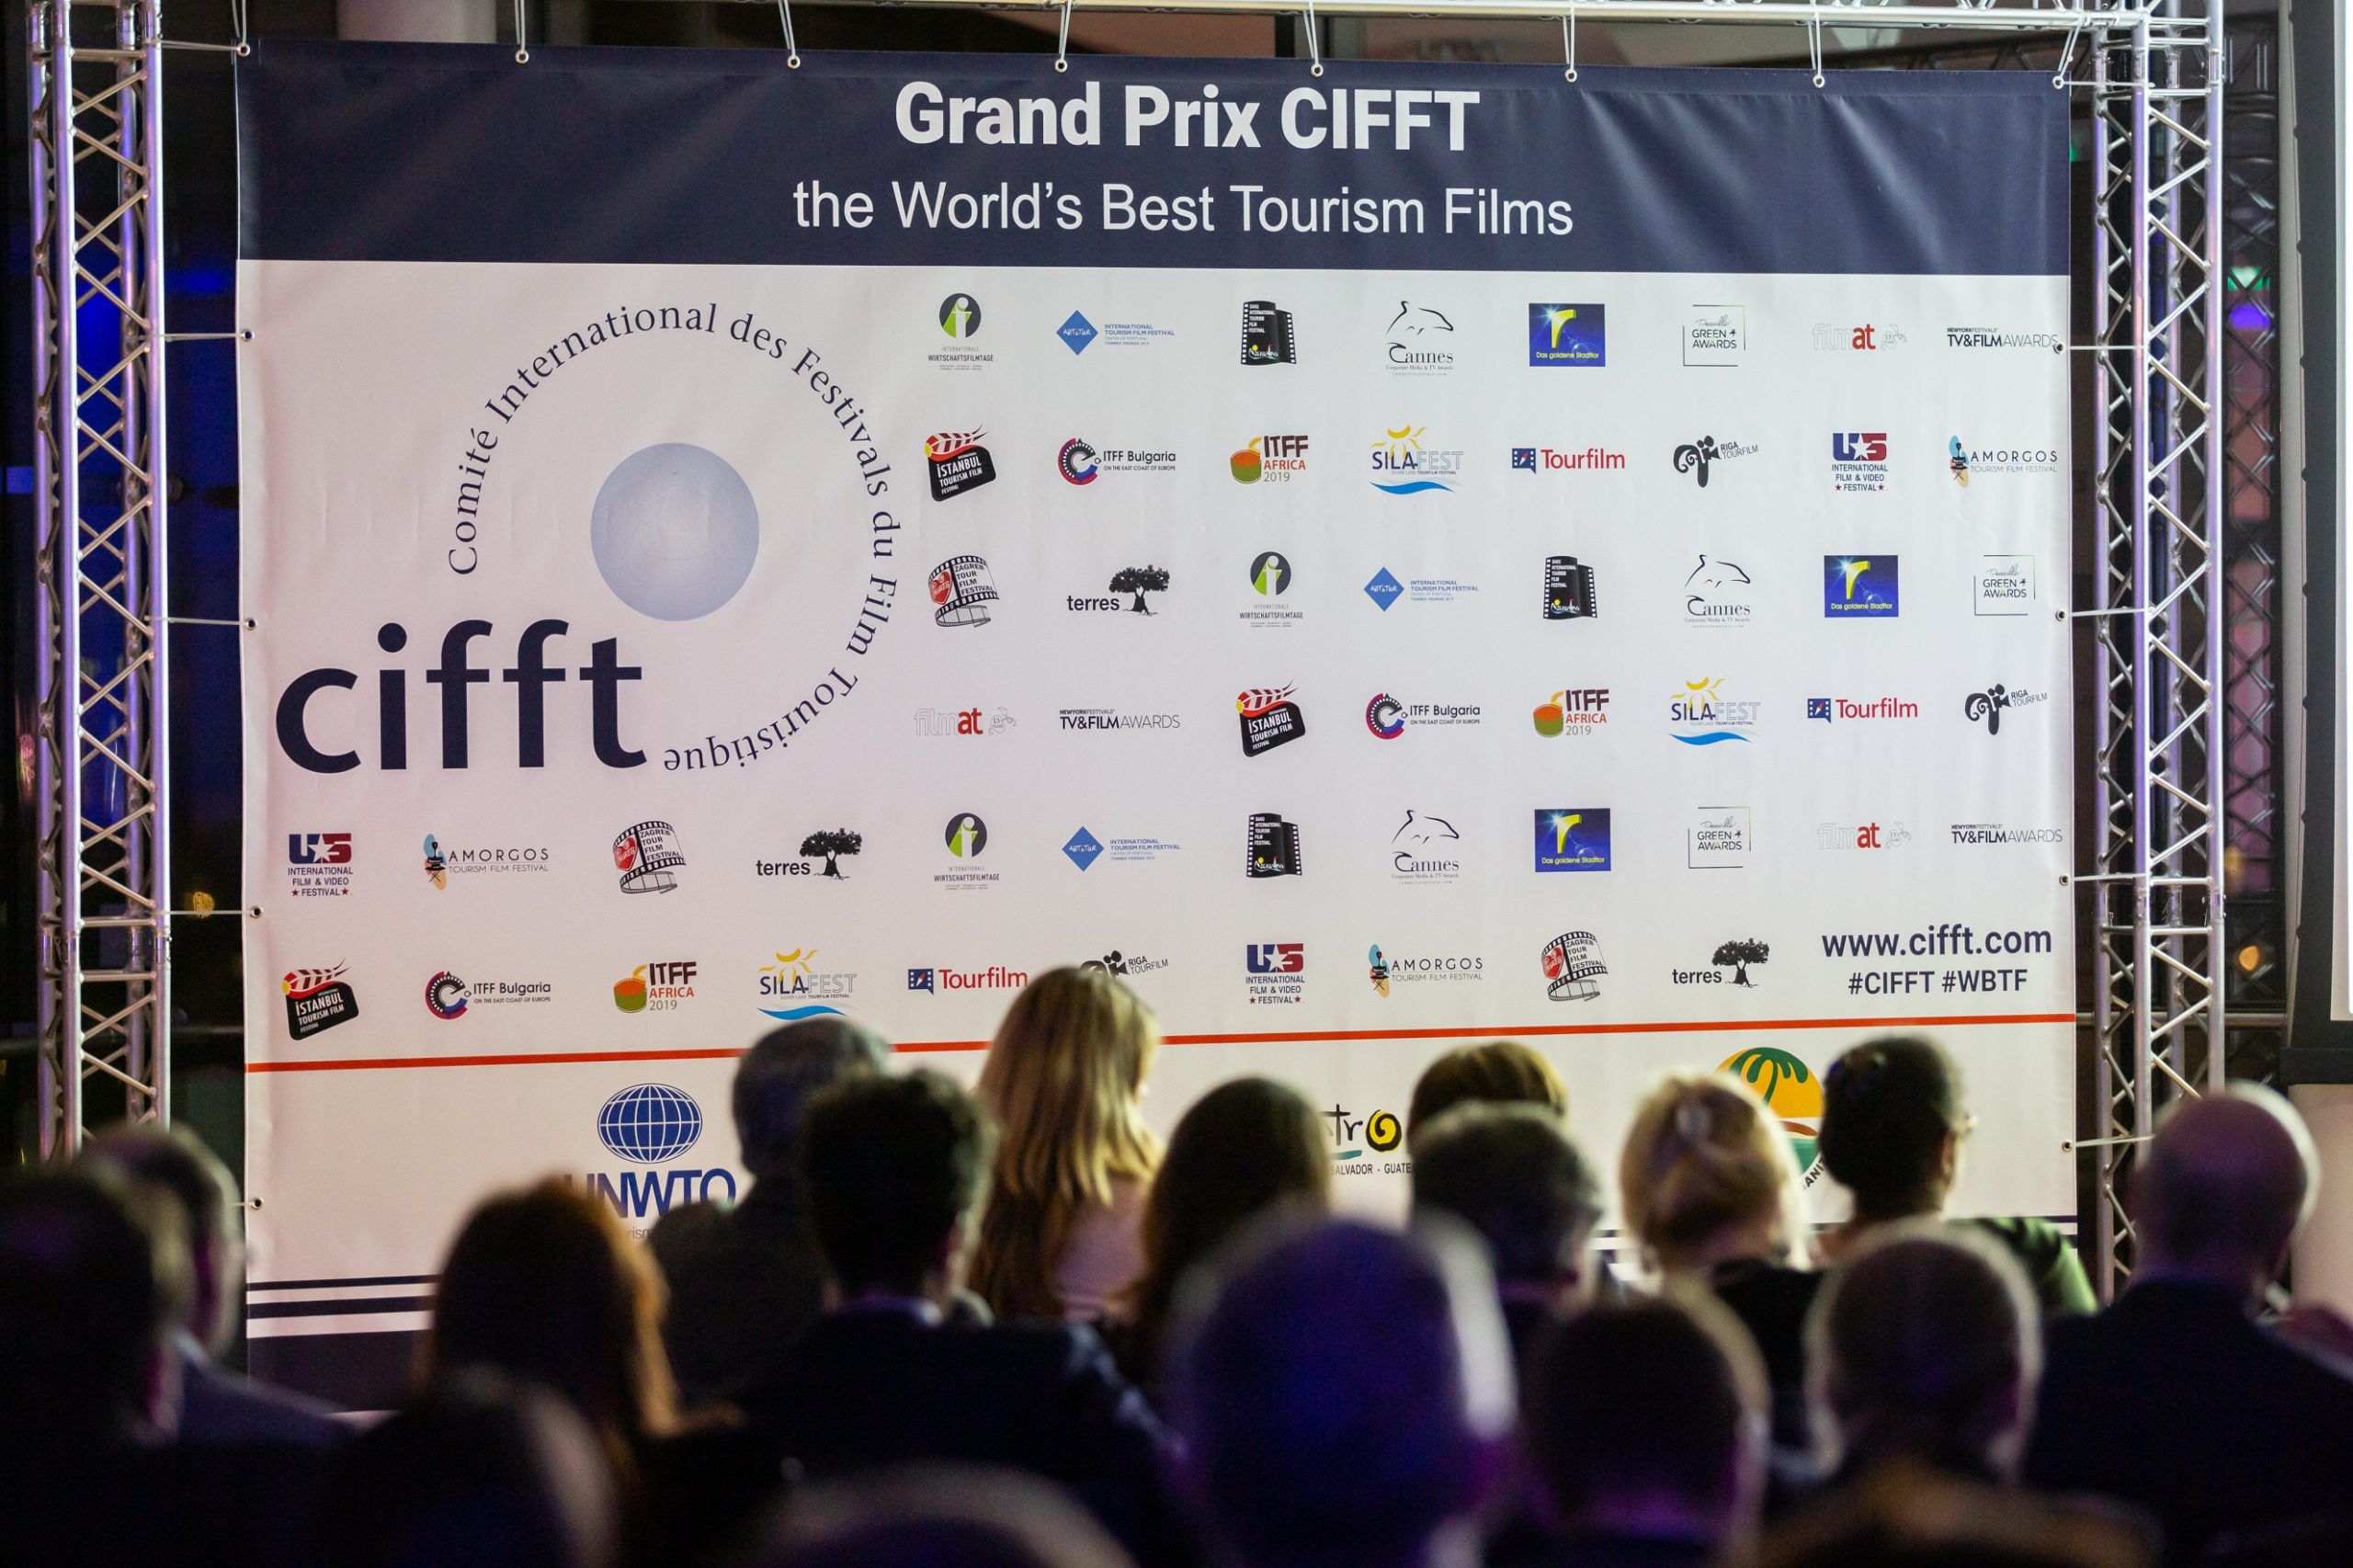 Grand-Prix-CIFFT-Preisverleihung